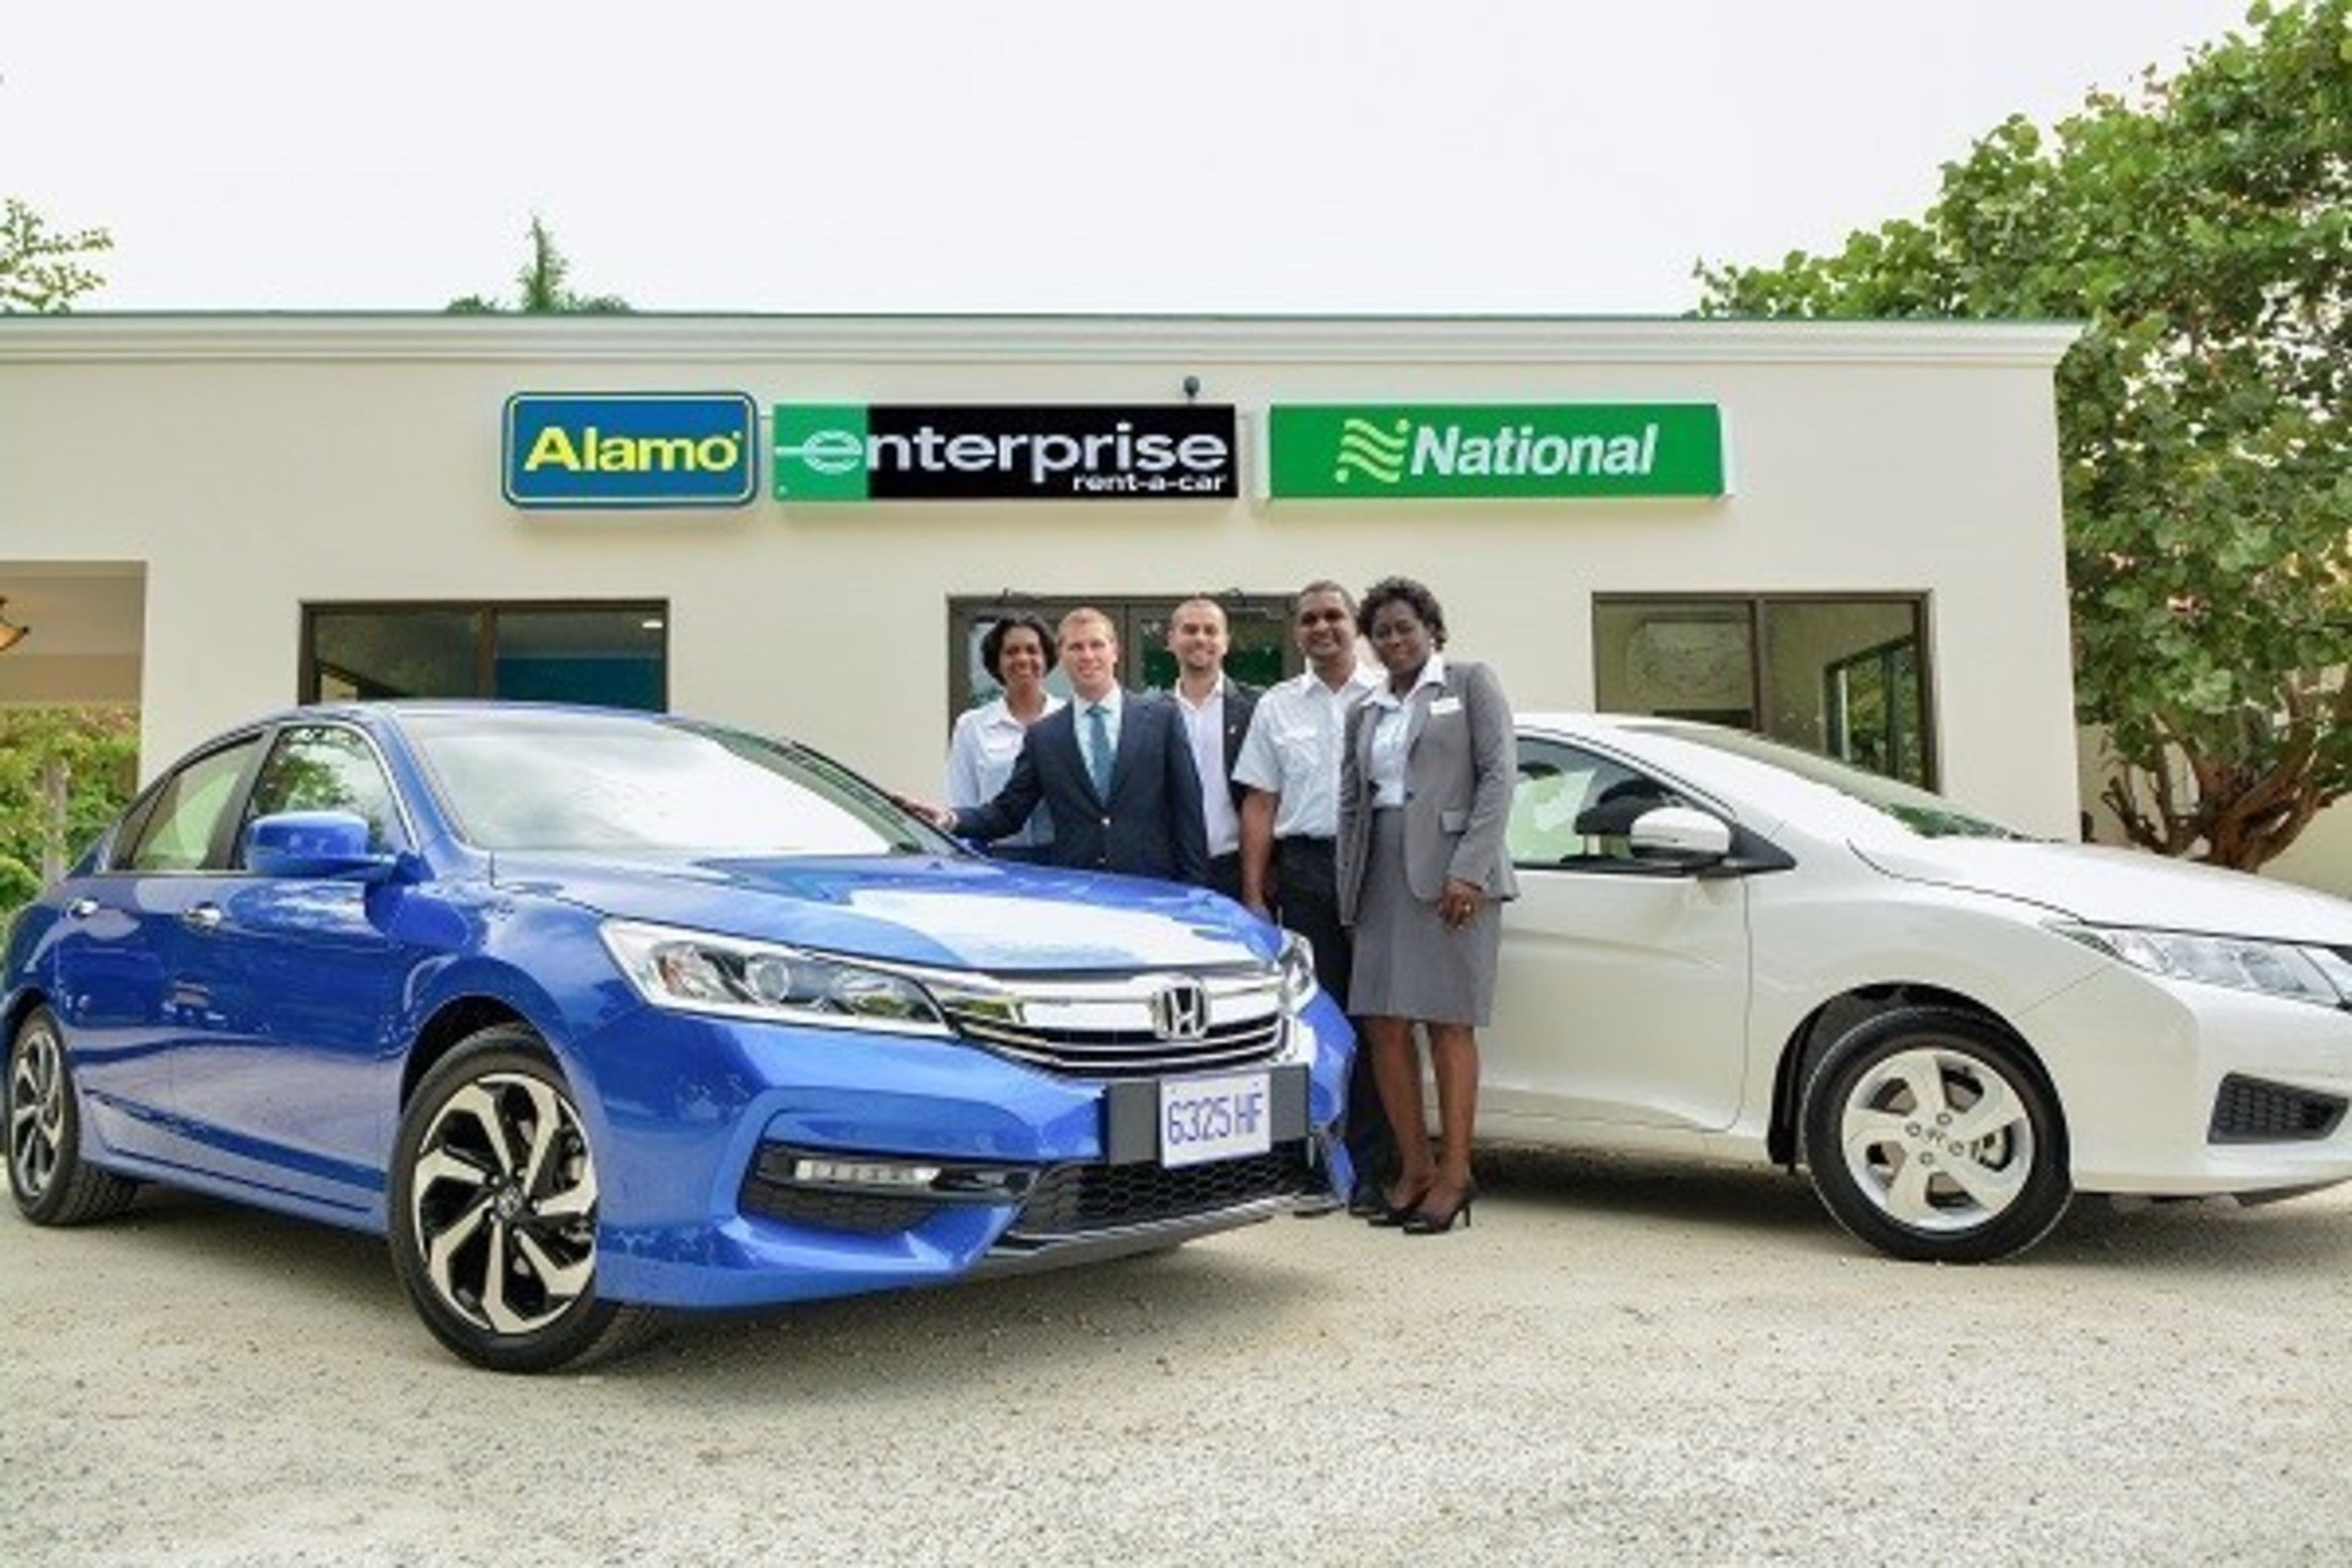 New Enterprise, National And Alamo Car Rental Locations